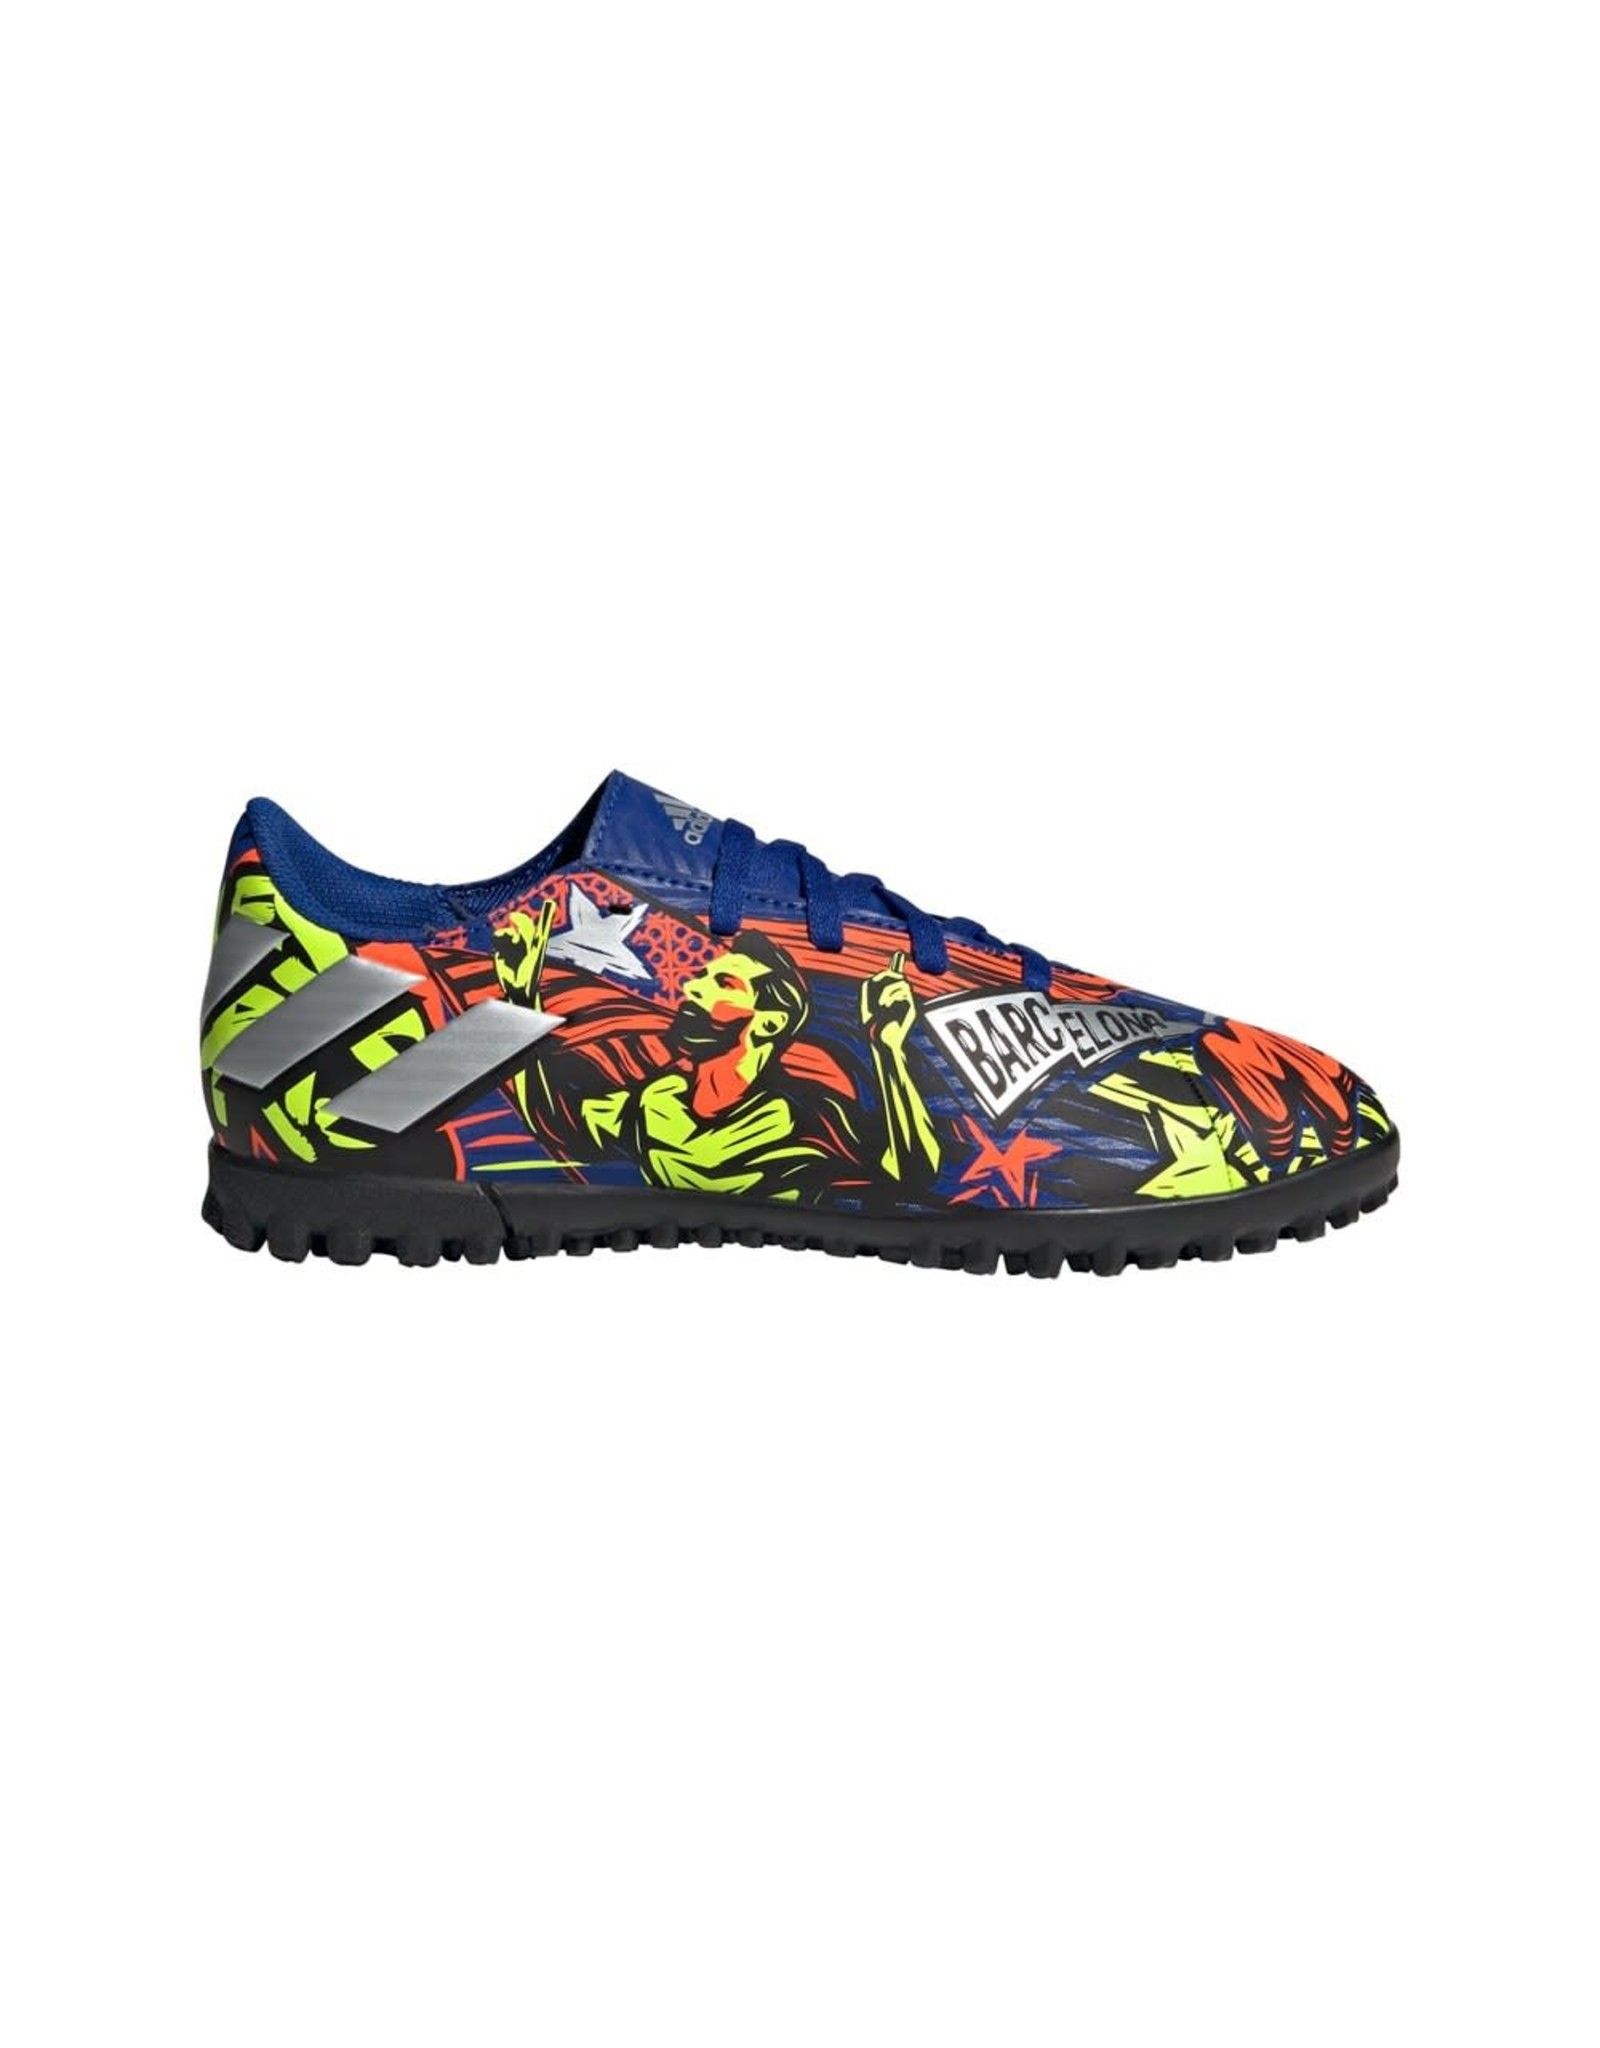 Adidas ADIDAS NEMEZIZ MESSI 19.4 TF J (ROYBLU/SILVMT/SYELLO)